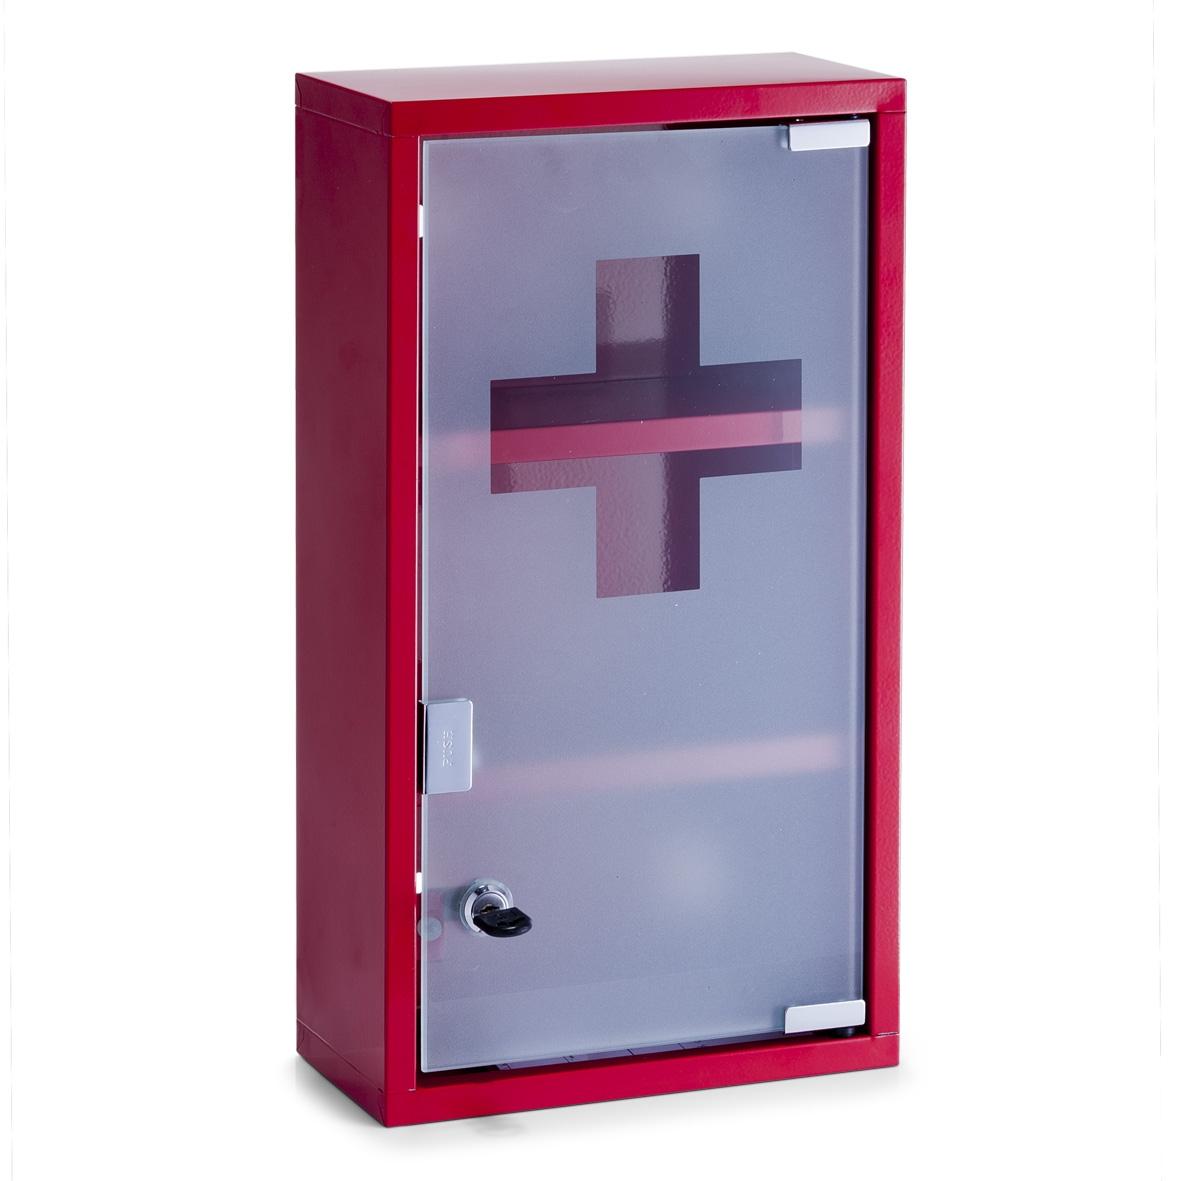 Dulap pentru medicamente, 2 rafturi, Metal Red, l25xA12xH45 cm imagine